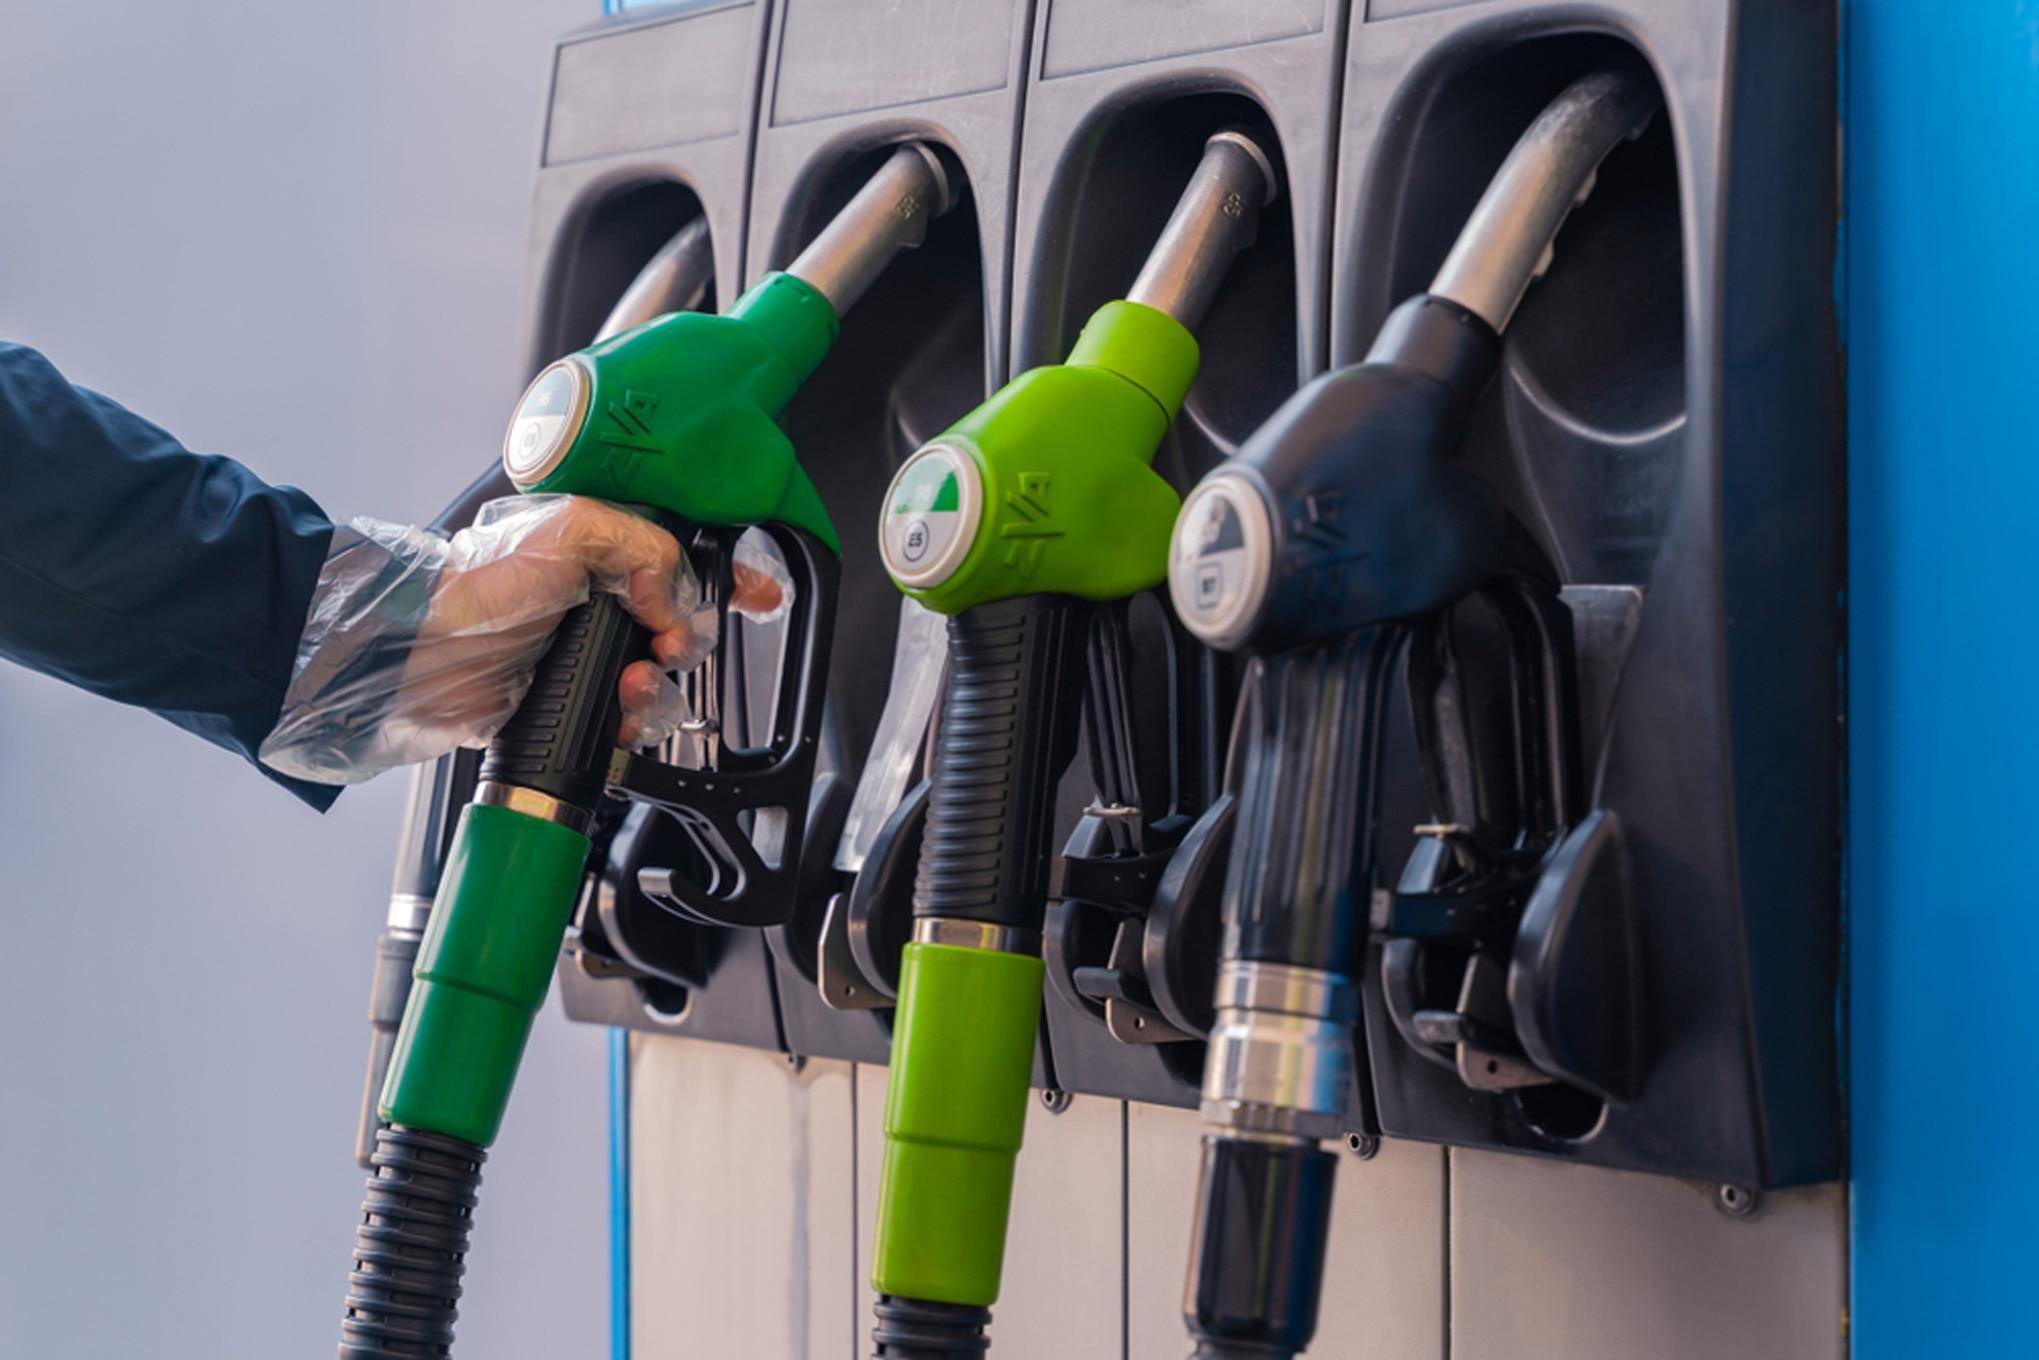 Best New Diesel Truck Fuel Economy